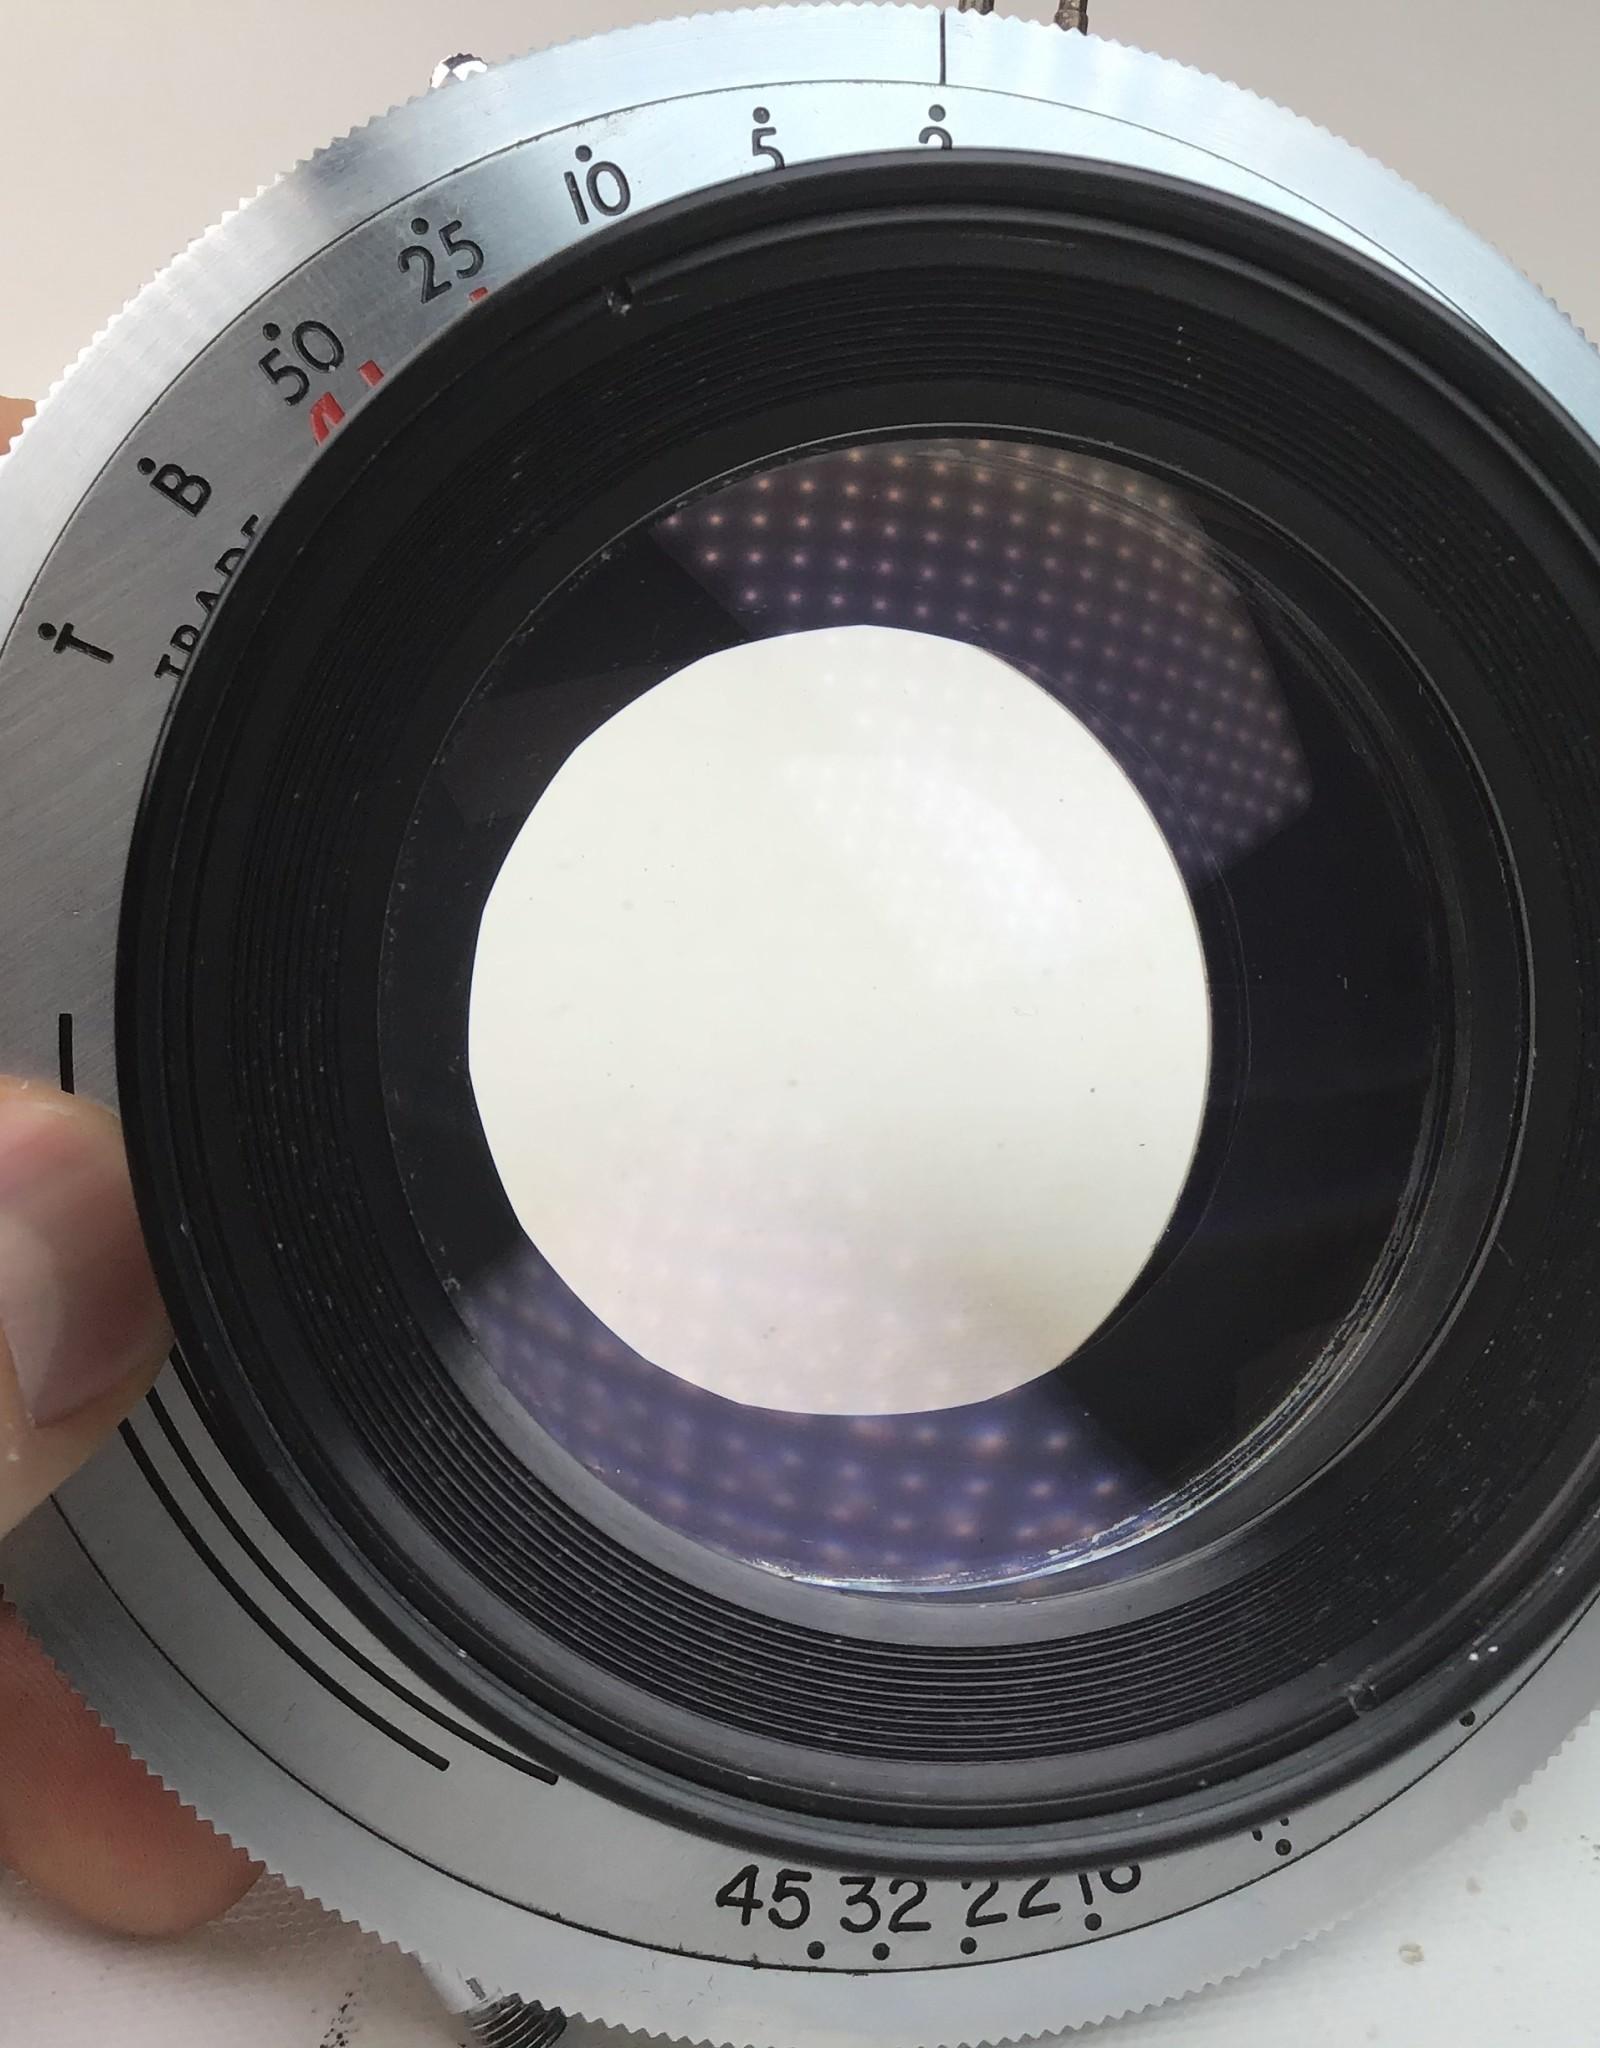 Carl Meyer 305mm (12 Inch) Anastigmat Lens in Alphax Shutter Used Good